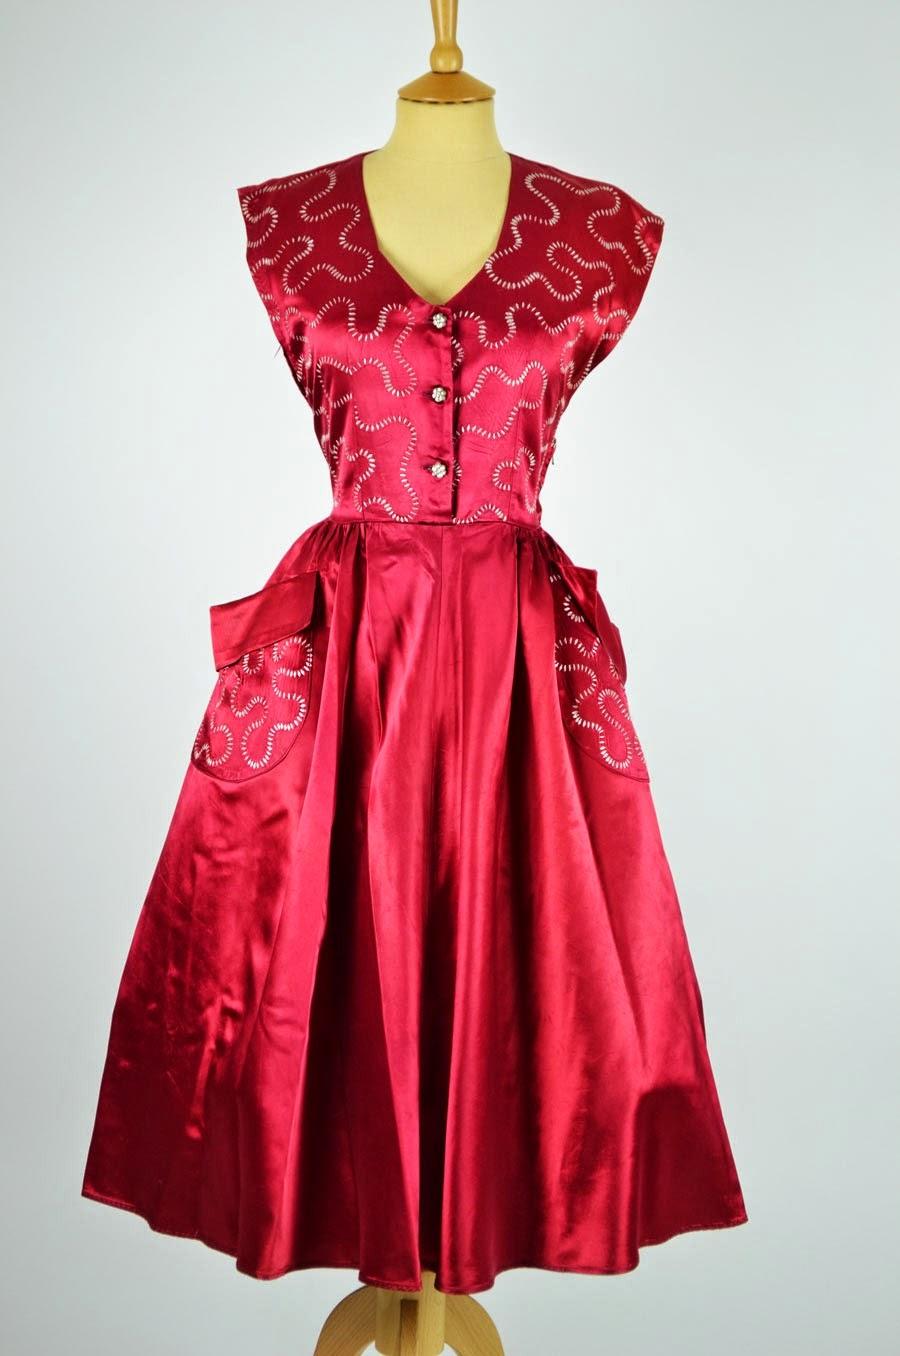 Vintage Skirts And Dresses